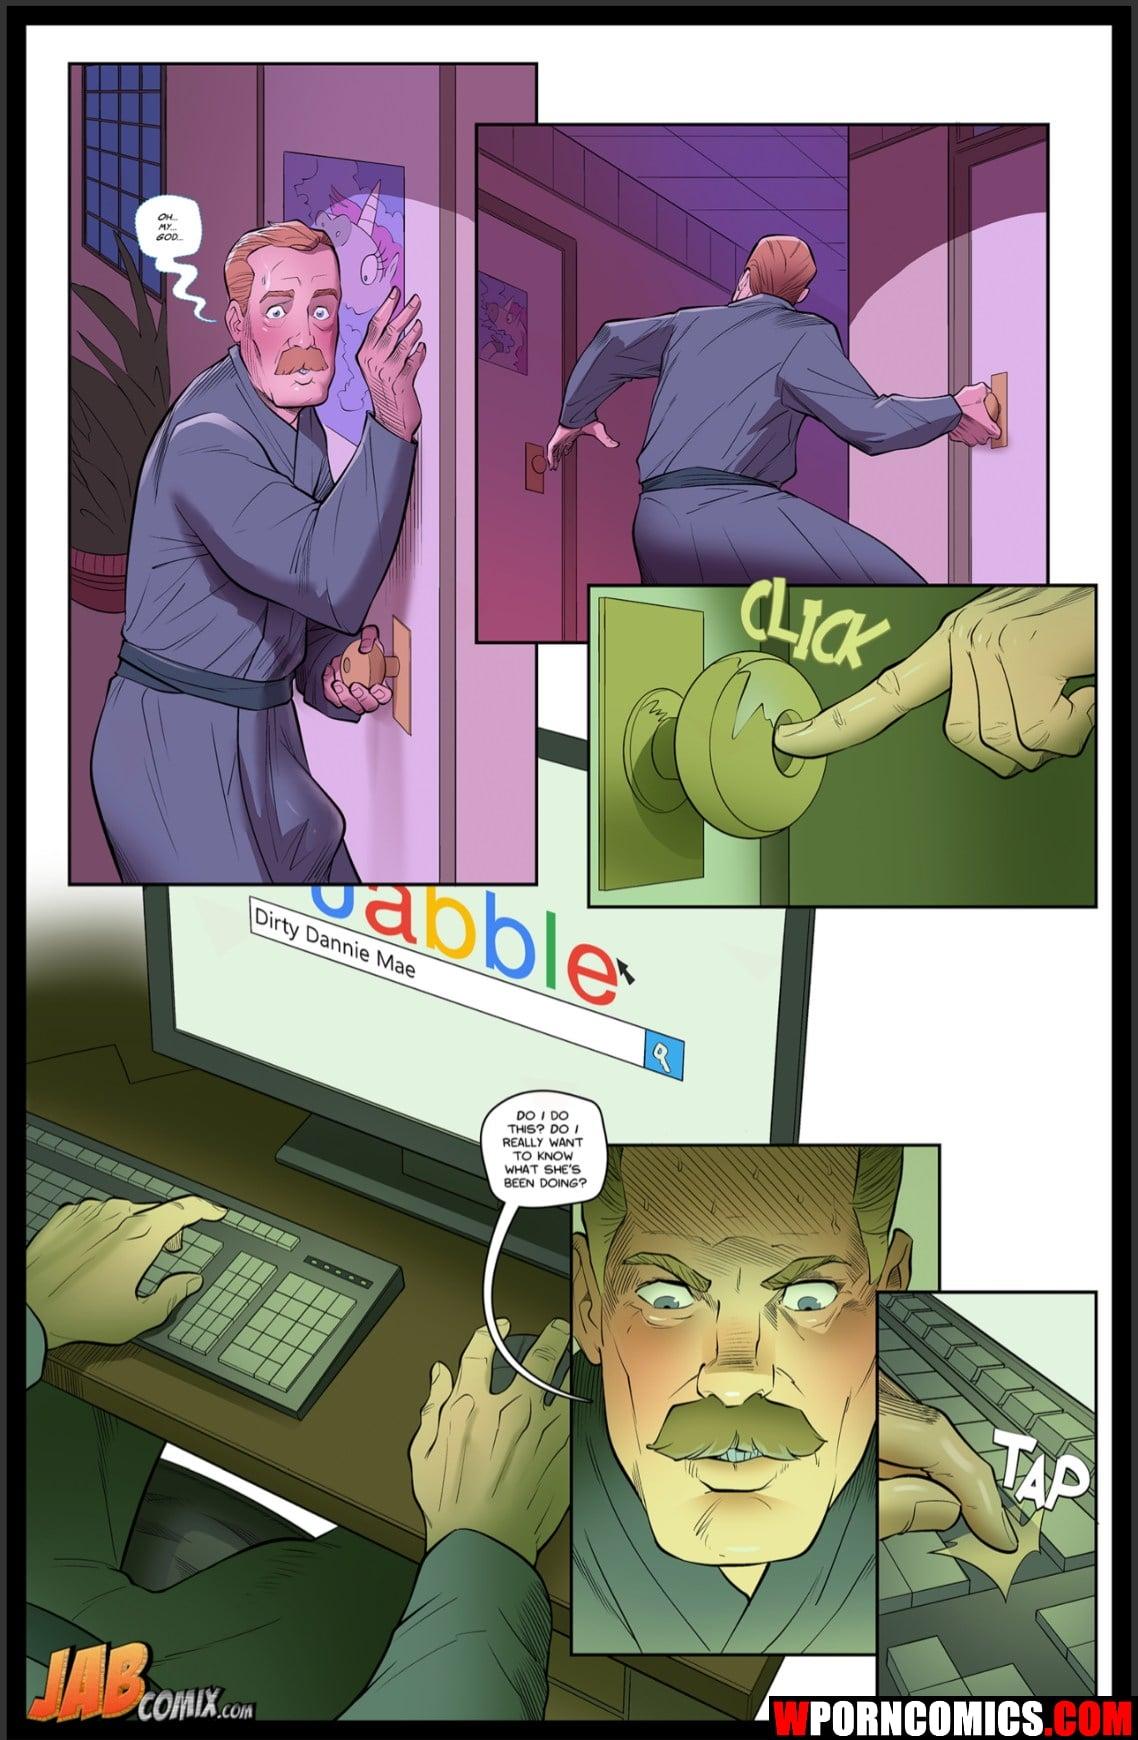 porn-comic-bubble-butt-princess-2020-01-26/porn-comic-bubble-butt-princess-2020-01-26-43216.jpg